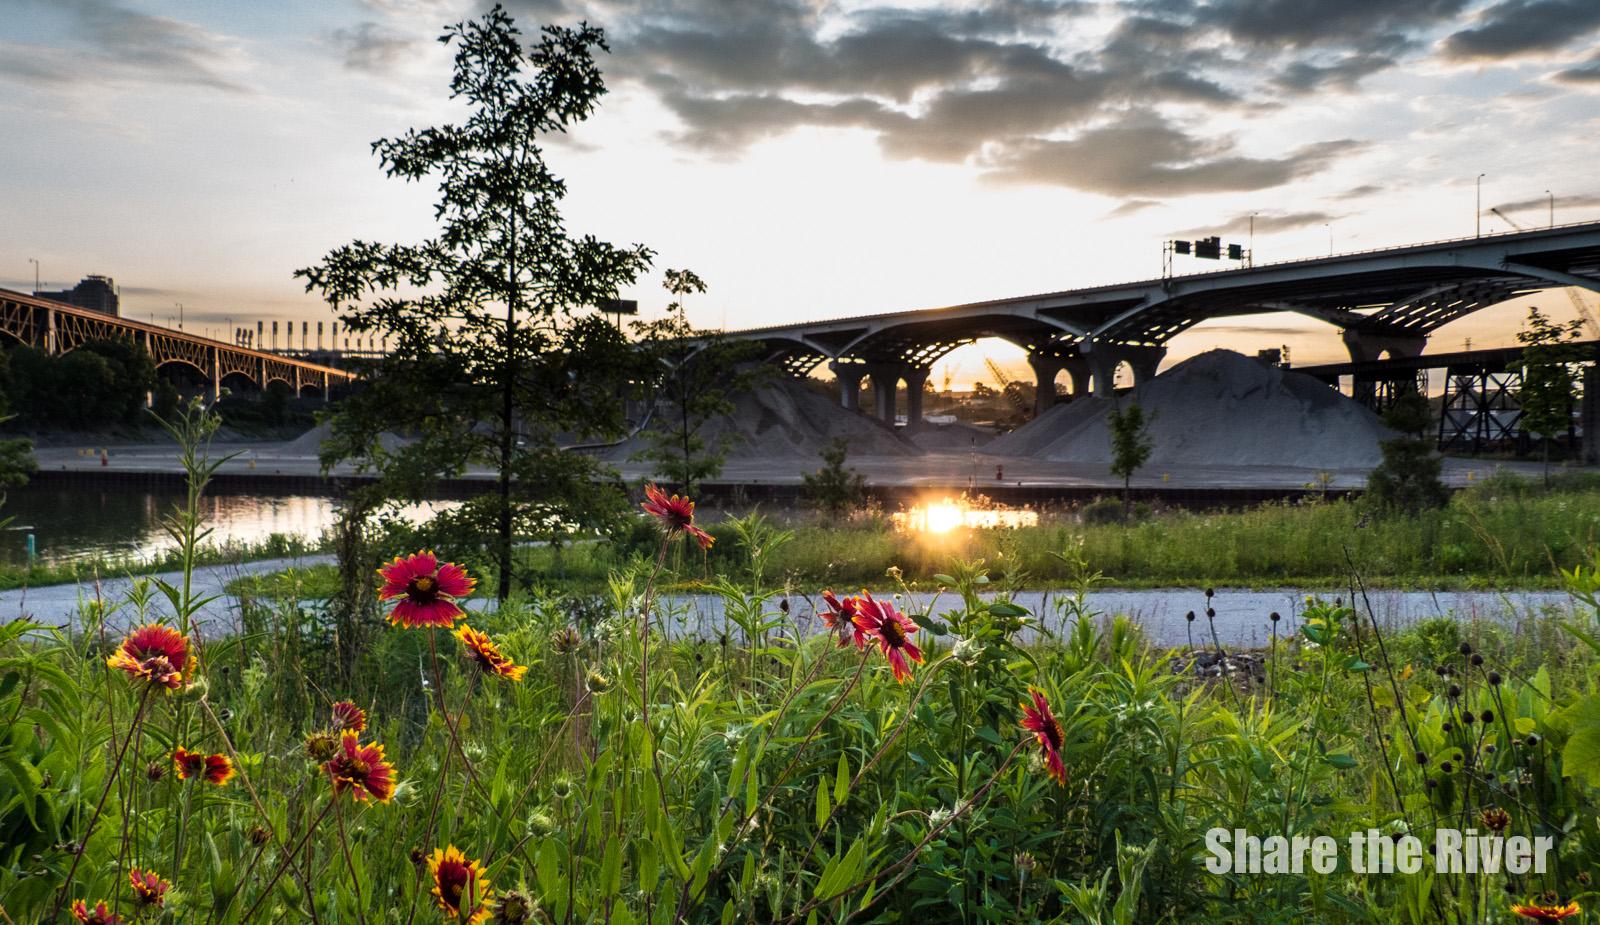 Innerbelt_Scranton Flats_wildflower_1.jpg